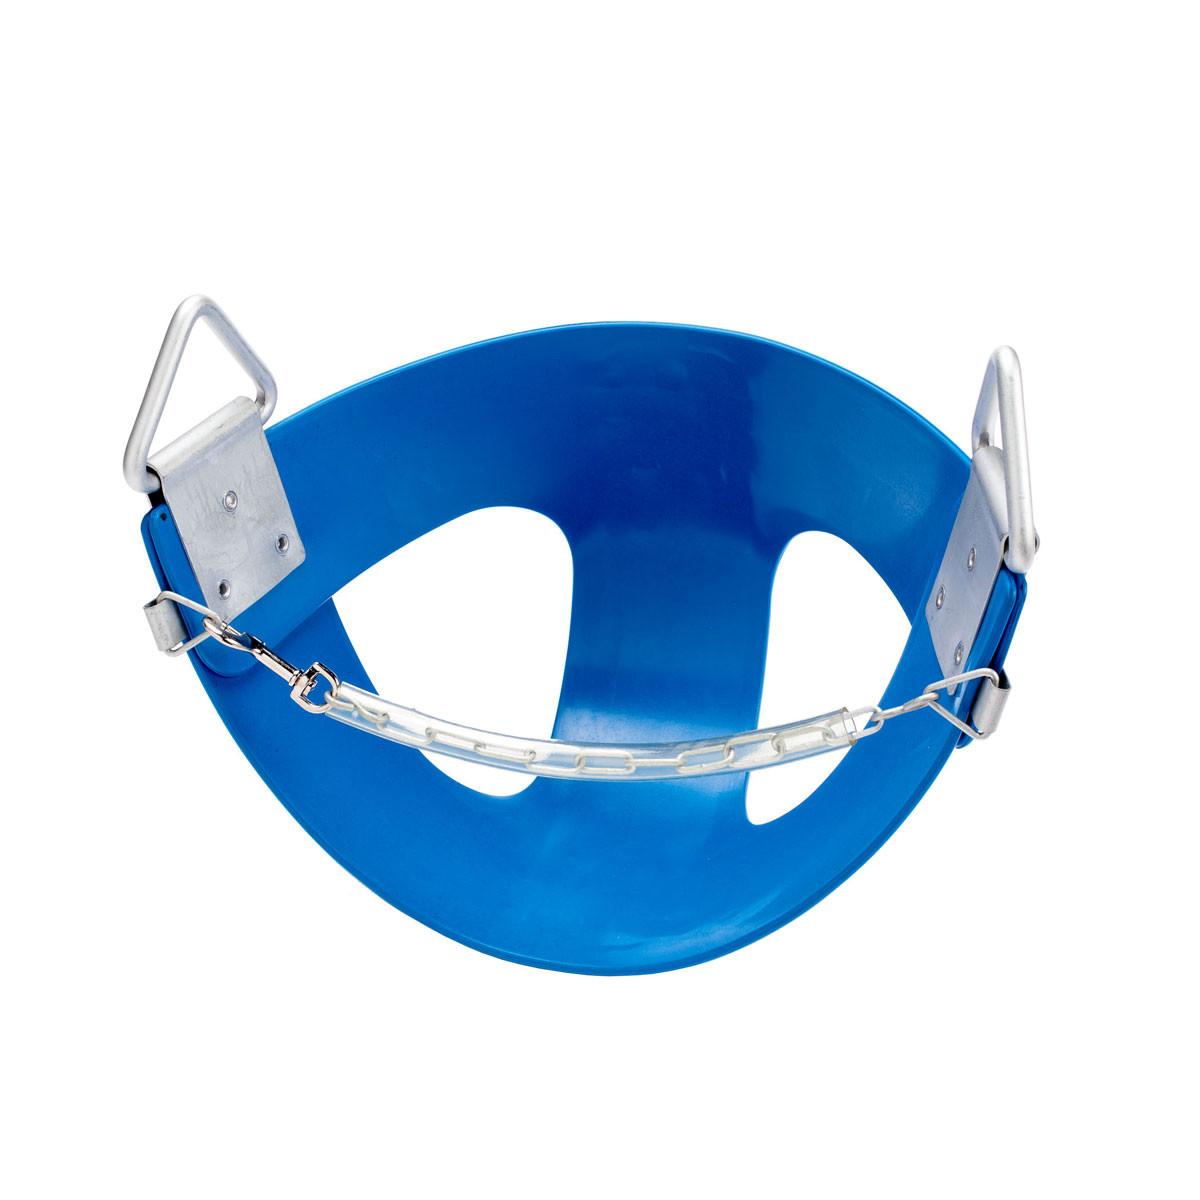 Commercial Rubber Half Bucket Swing Seat - Blue